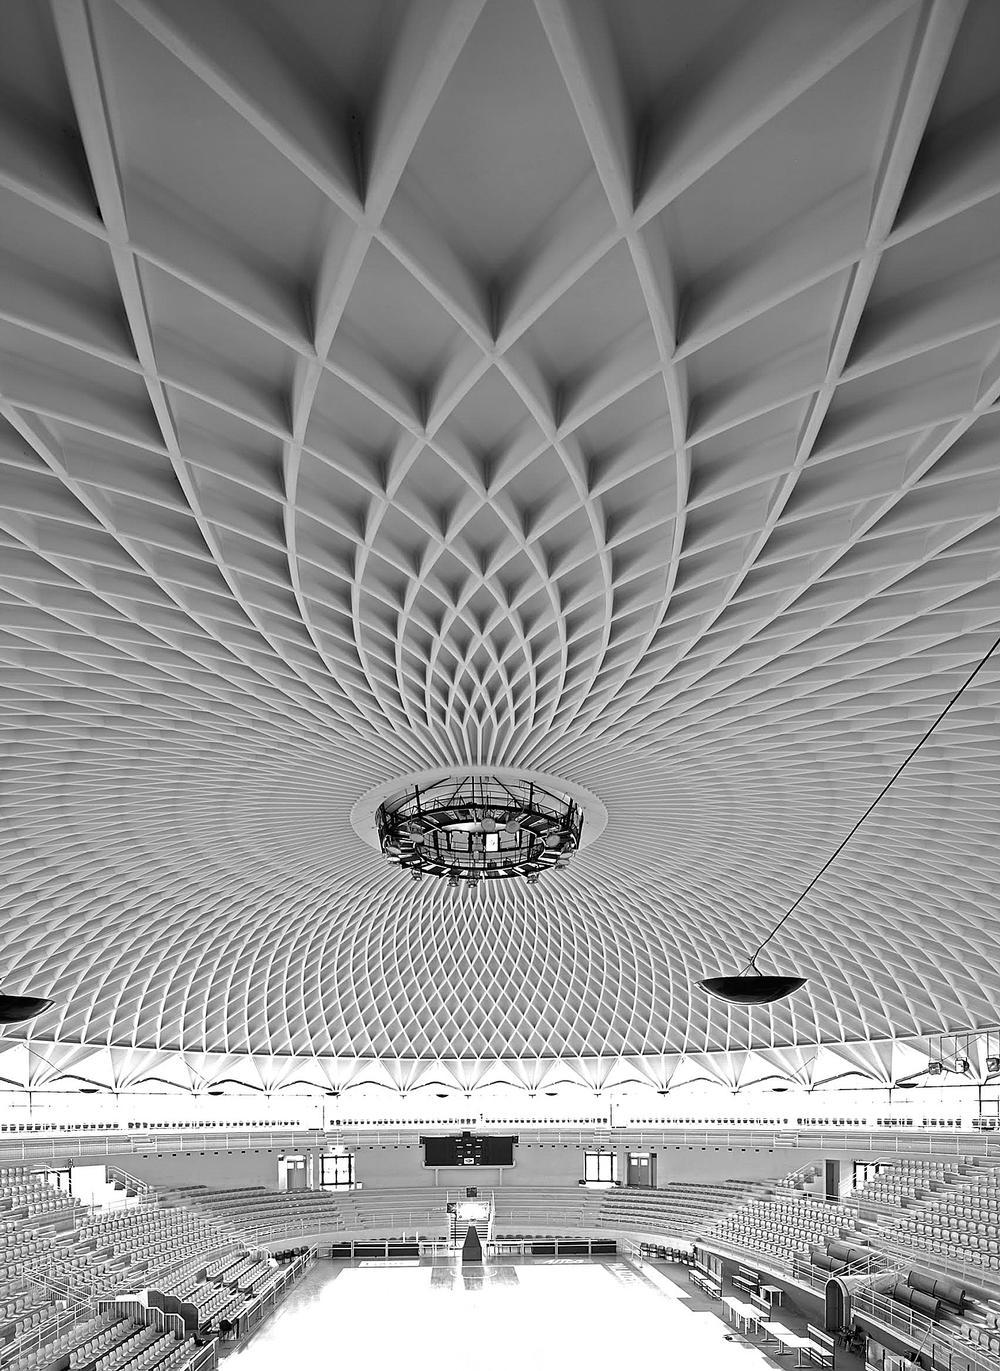 Michael Pawlyn: Using nature's genius in architecture